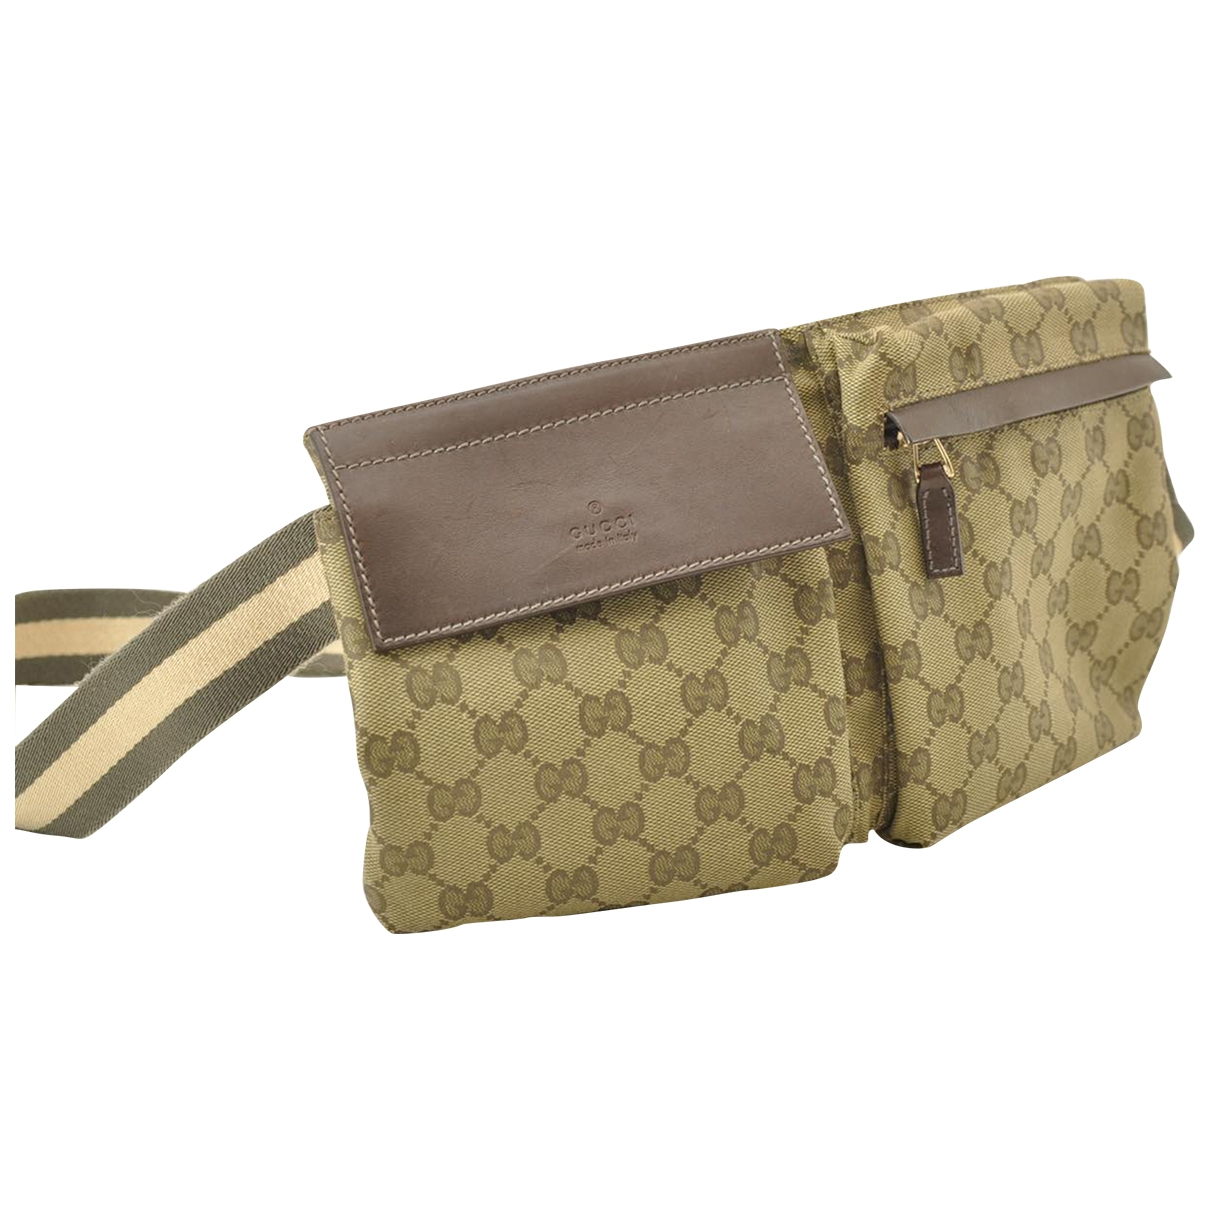 Gucci \N Beige Cloth Clutch bag for Women \N